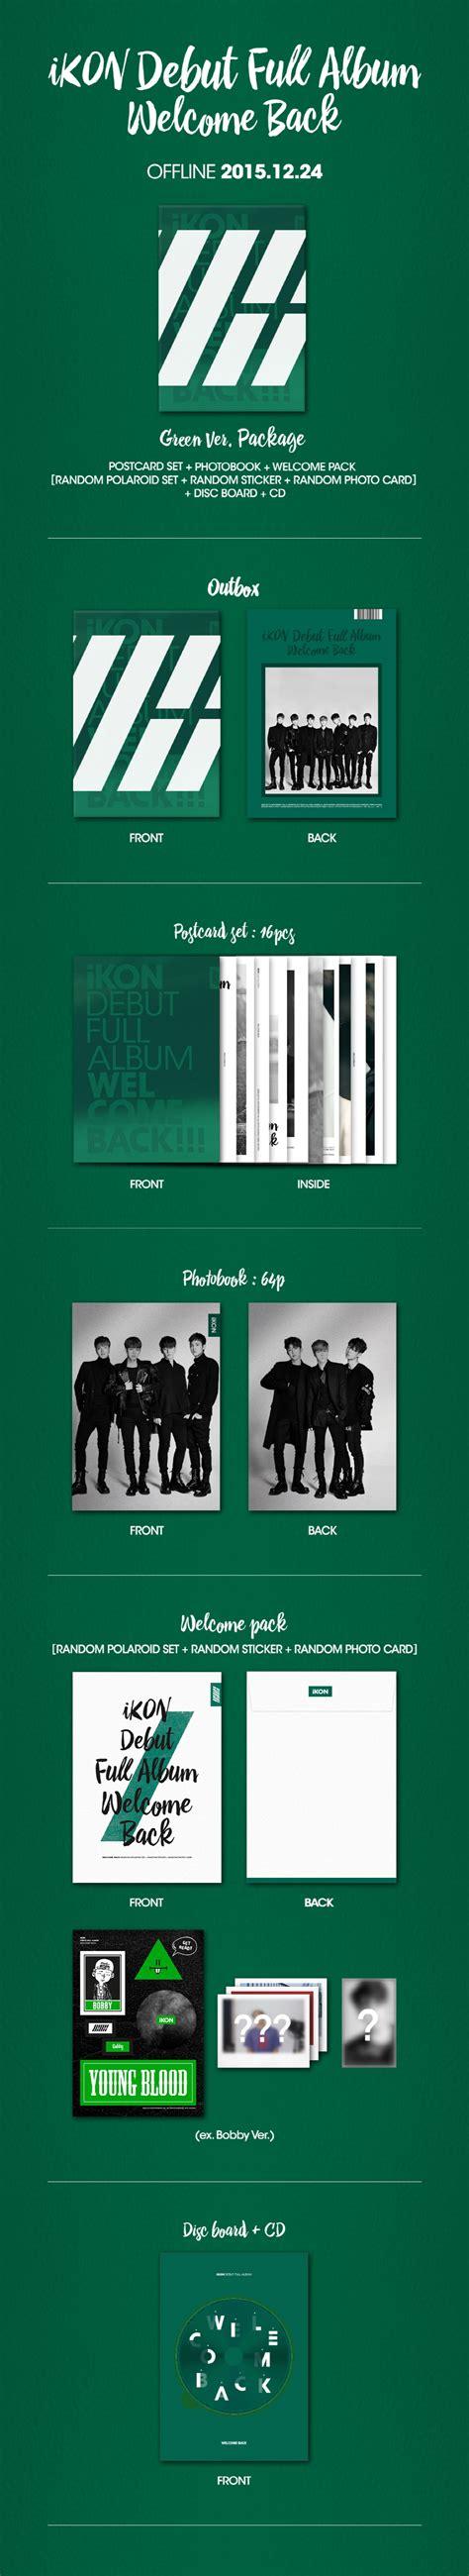 Ikon Welcome Back Debut Half Album yg eshop ikon debut album welcome back kpop new ebay